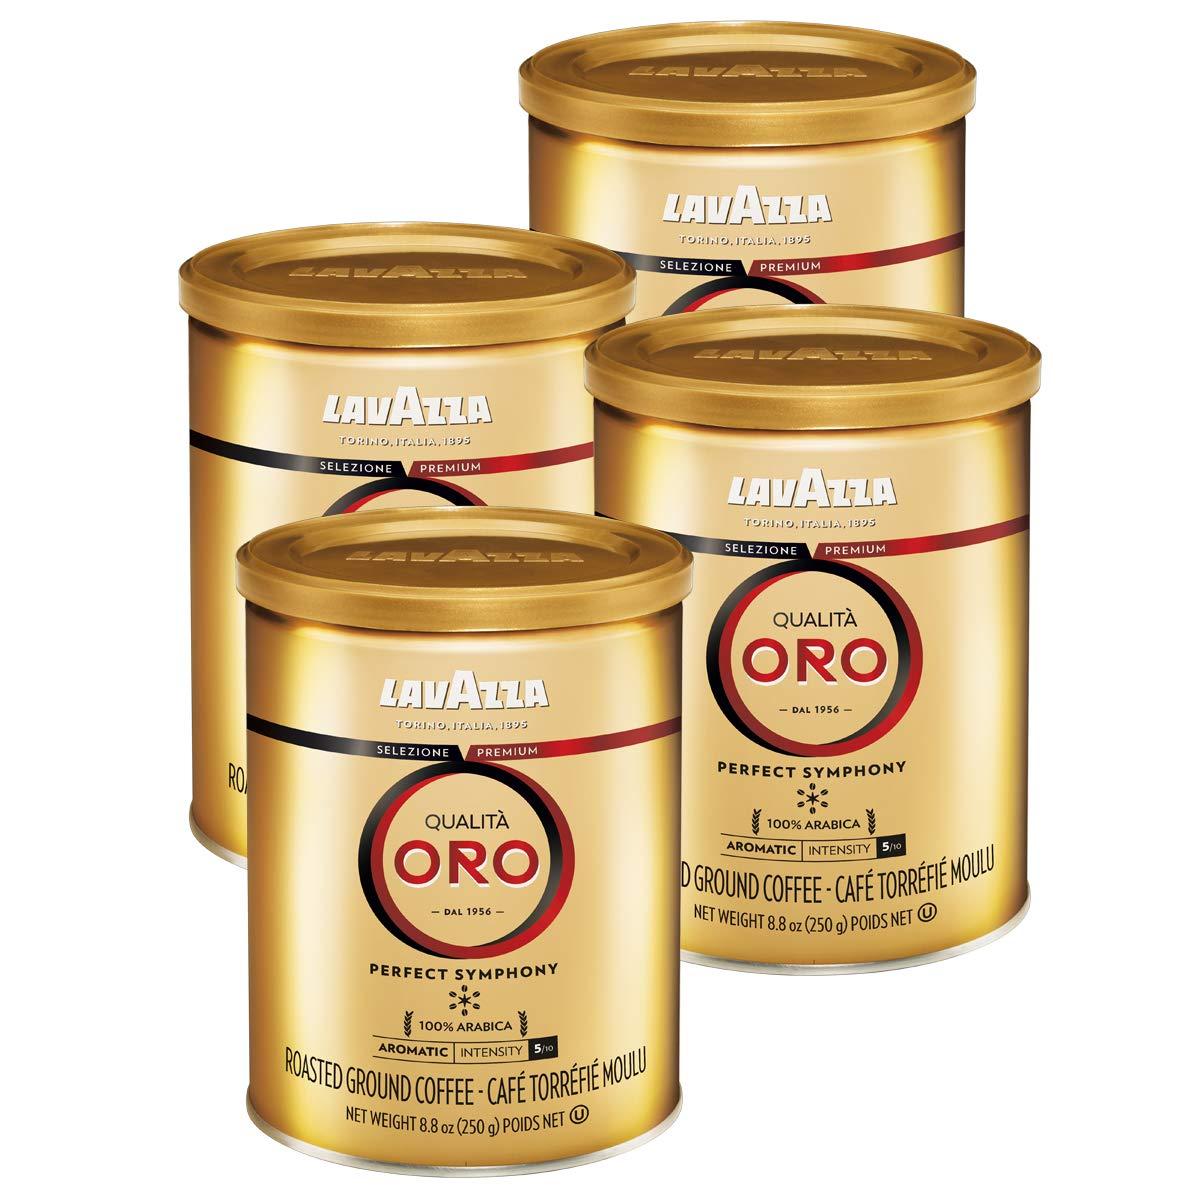 4-Cans 8.8oz. LavAzza Qualita Oro Ground Coffee Blend (Medium Roast) $18.18 w/s&s